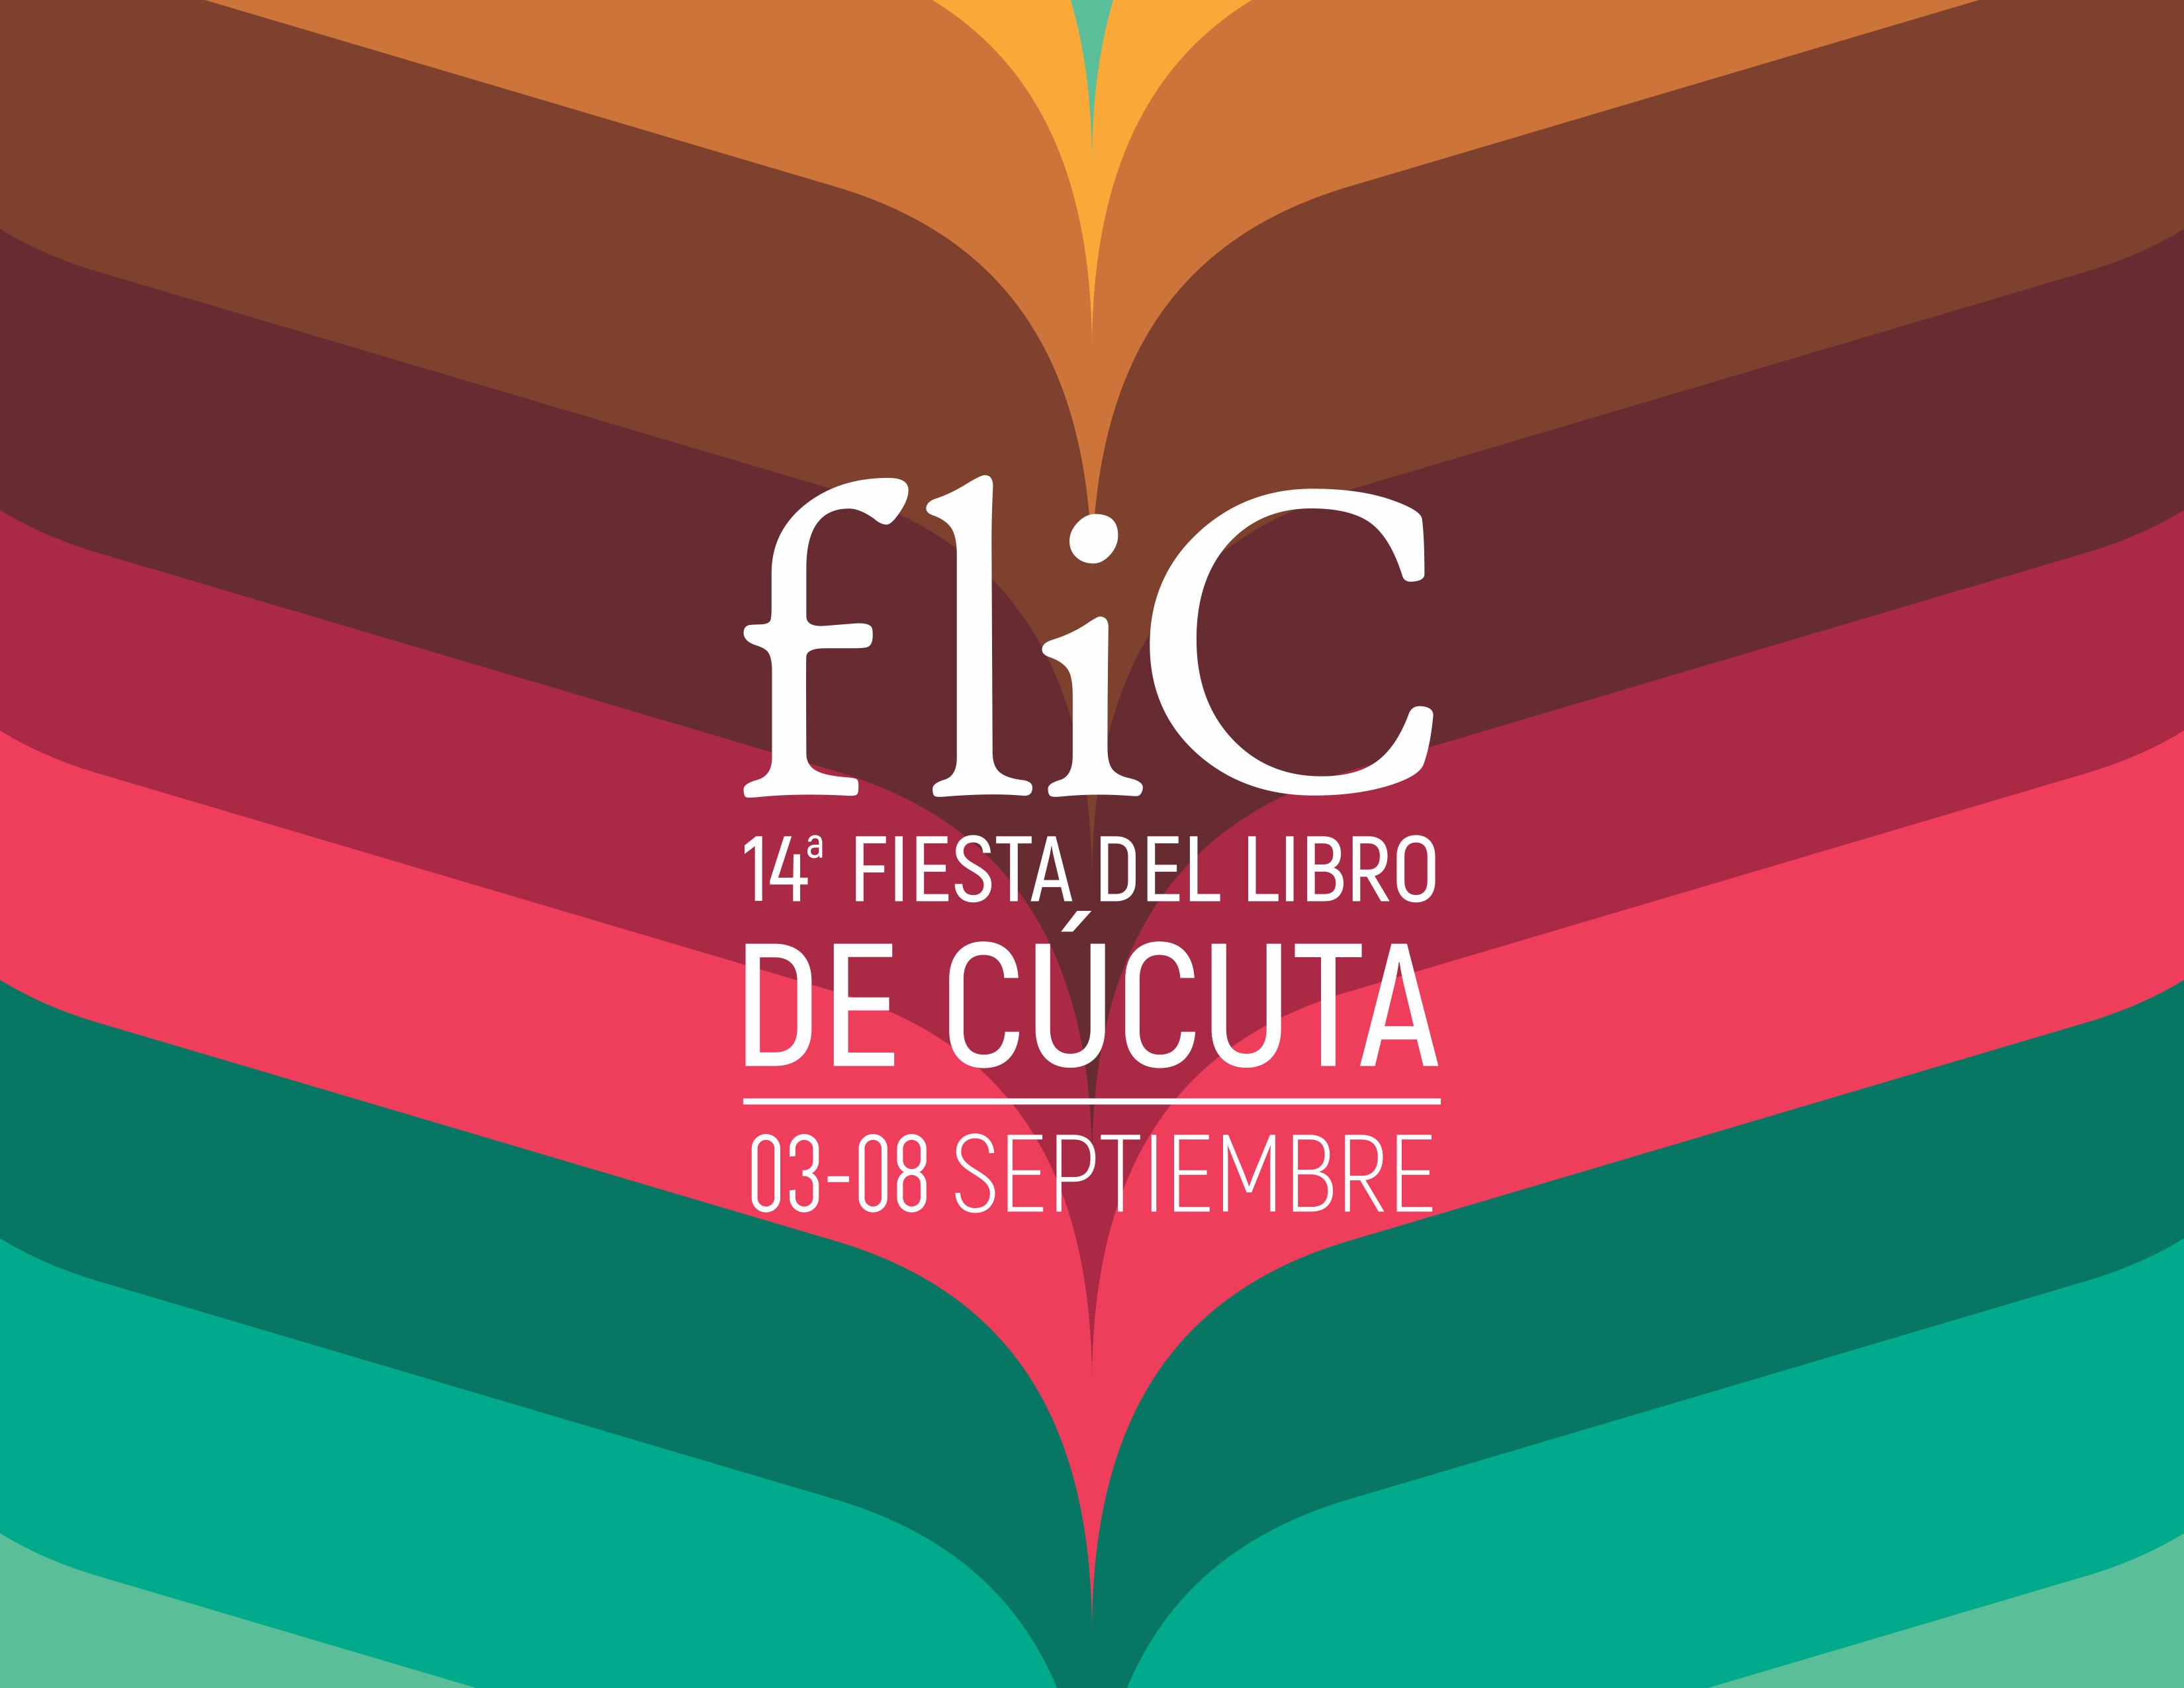 La U. N. vive la XIV Feria del Libro de Cúcuta 2018